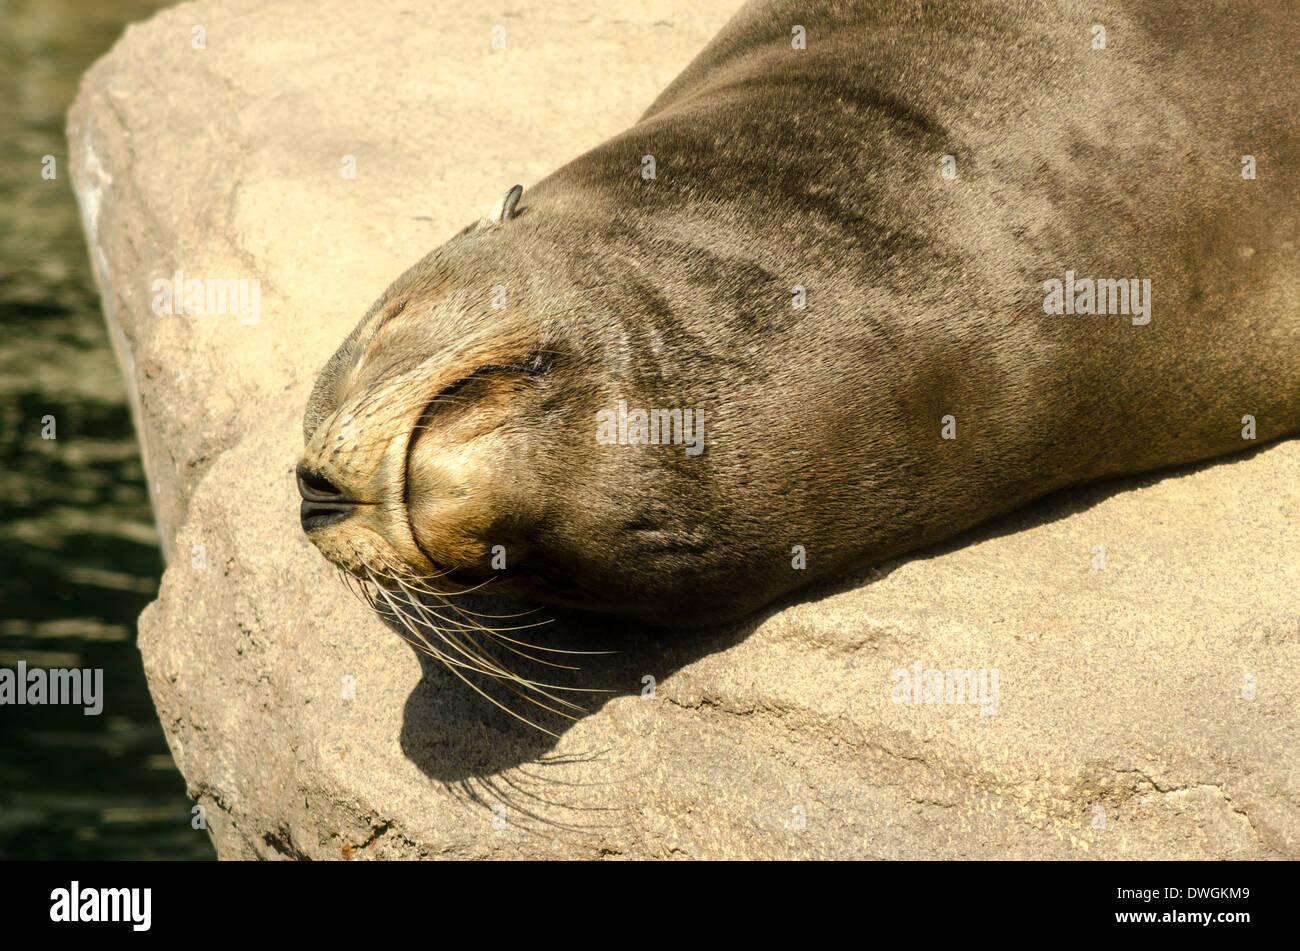 Closeup of the face of a sunbathing sea lion - Stock Image